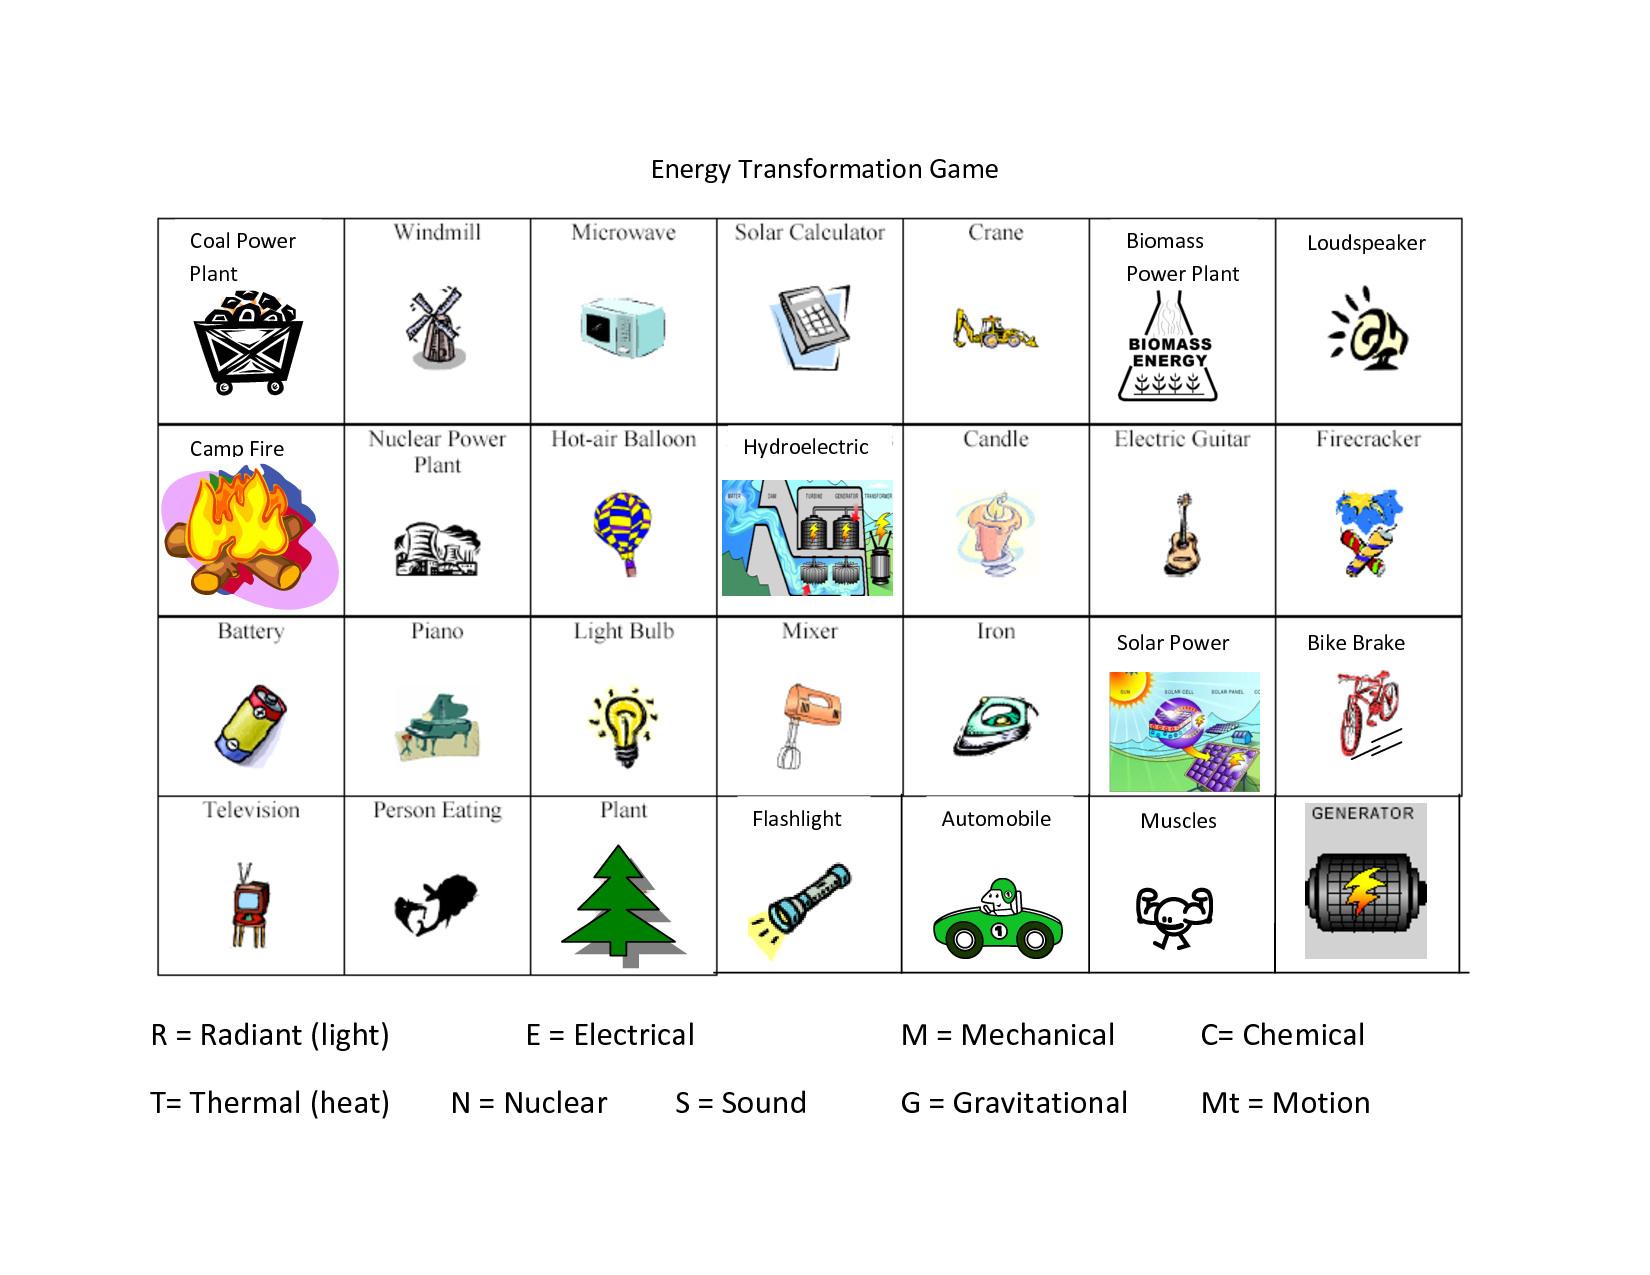 Energy Transformation Game Worksheet Answer Key